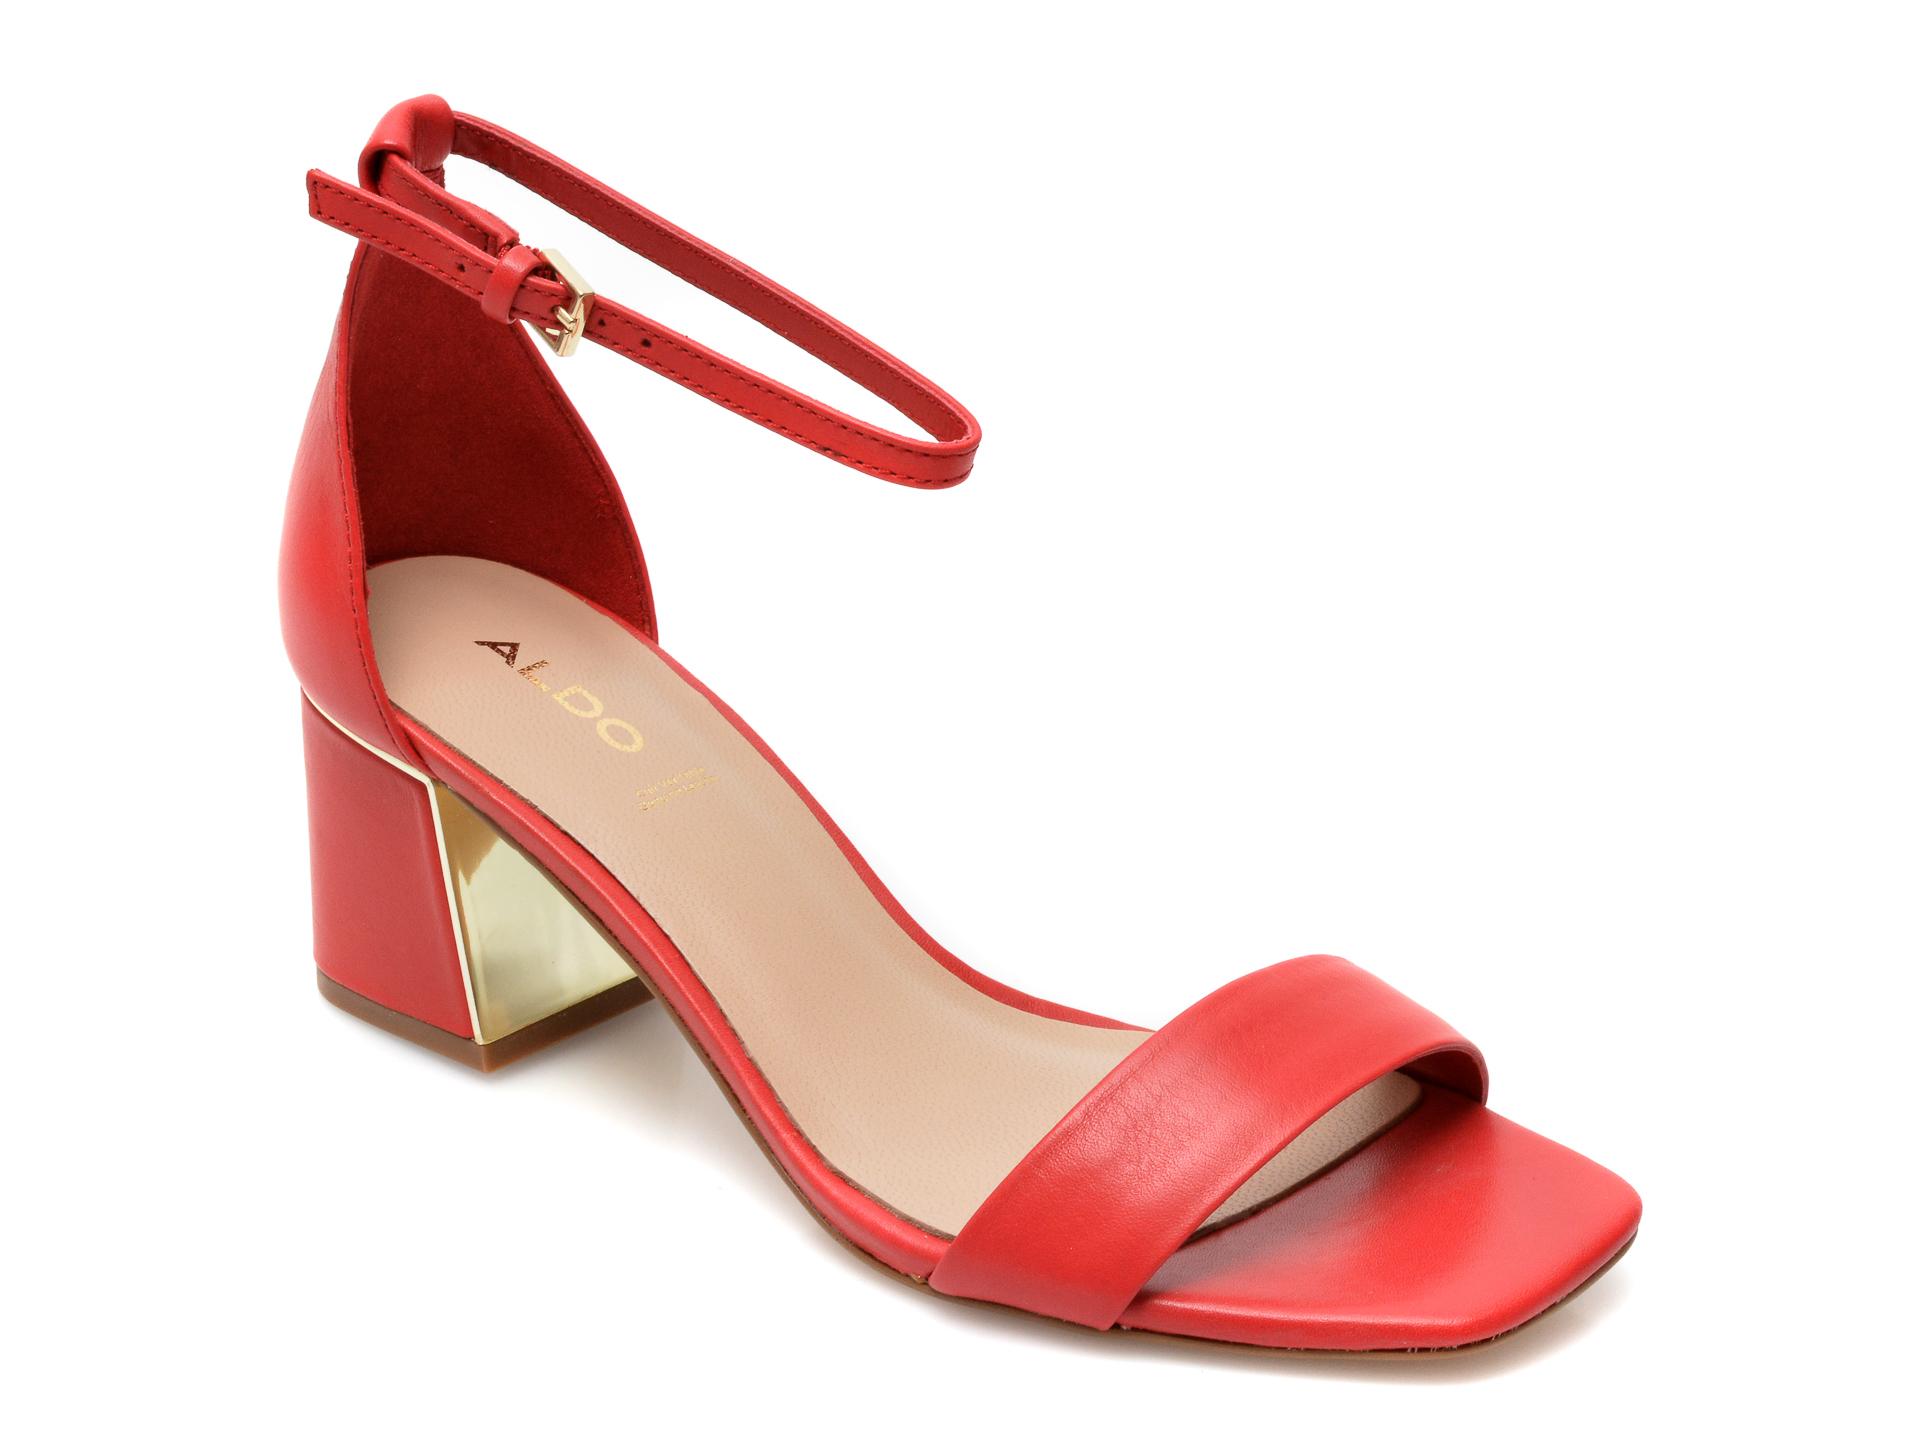 Sandale ALDO rosii, Kedeaviel600, din piele naturala imagine otter.ro 2021